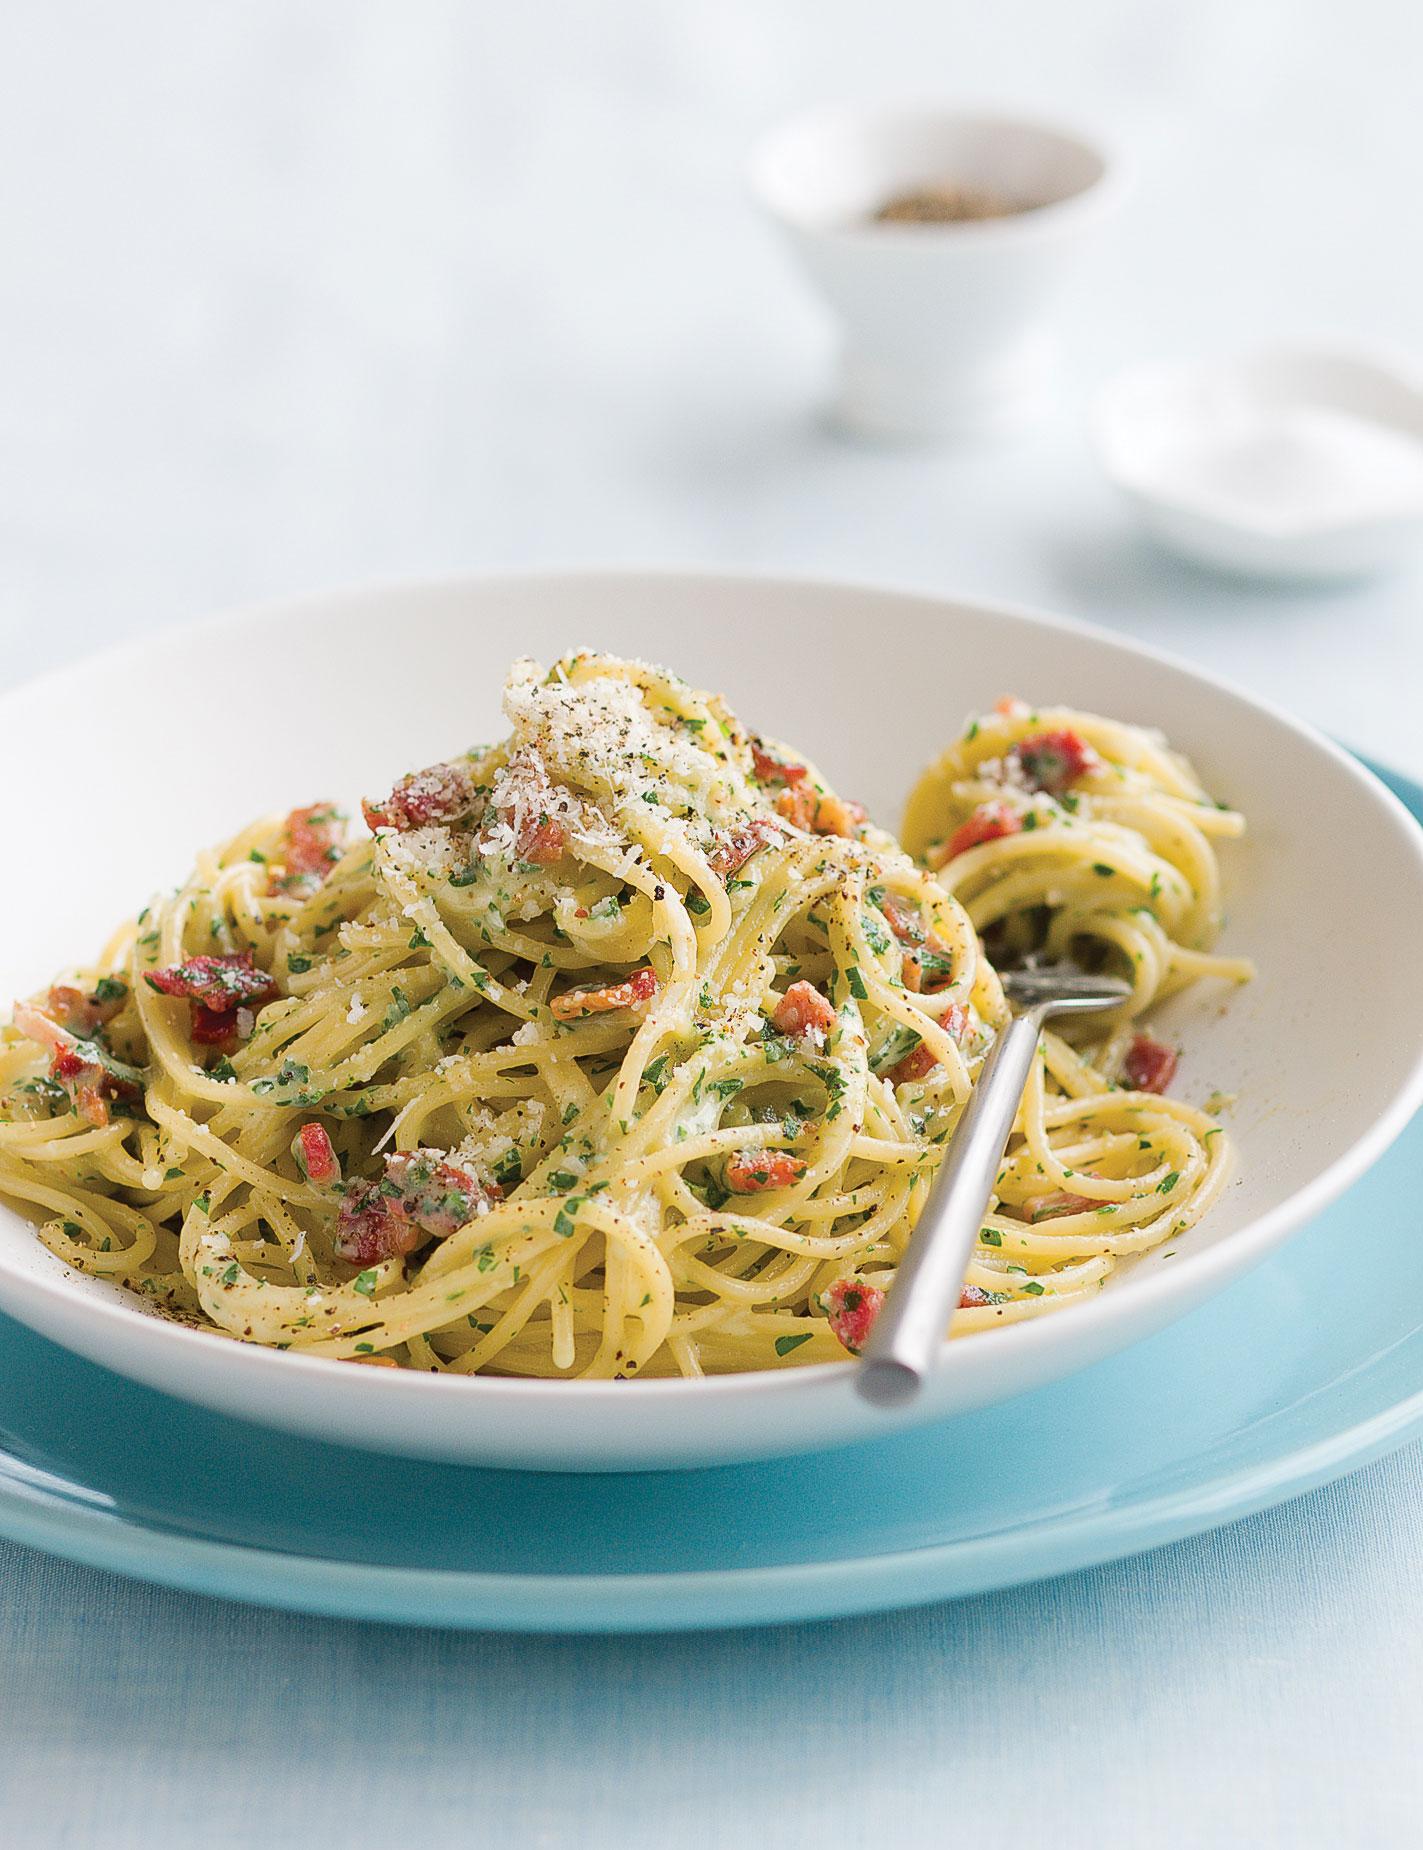 Spaghetti Carbonara with Belgian Abbey Dark or Dubbel